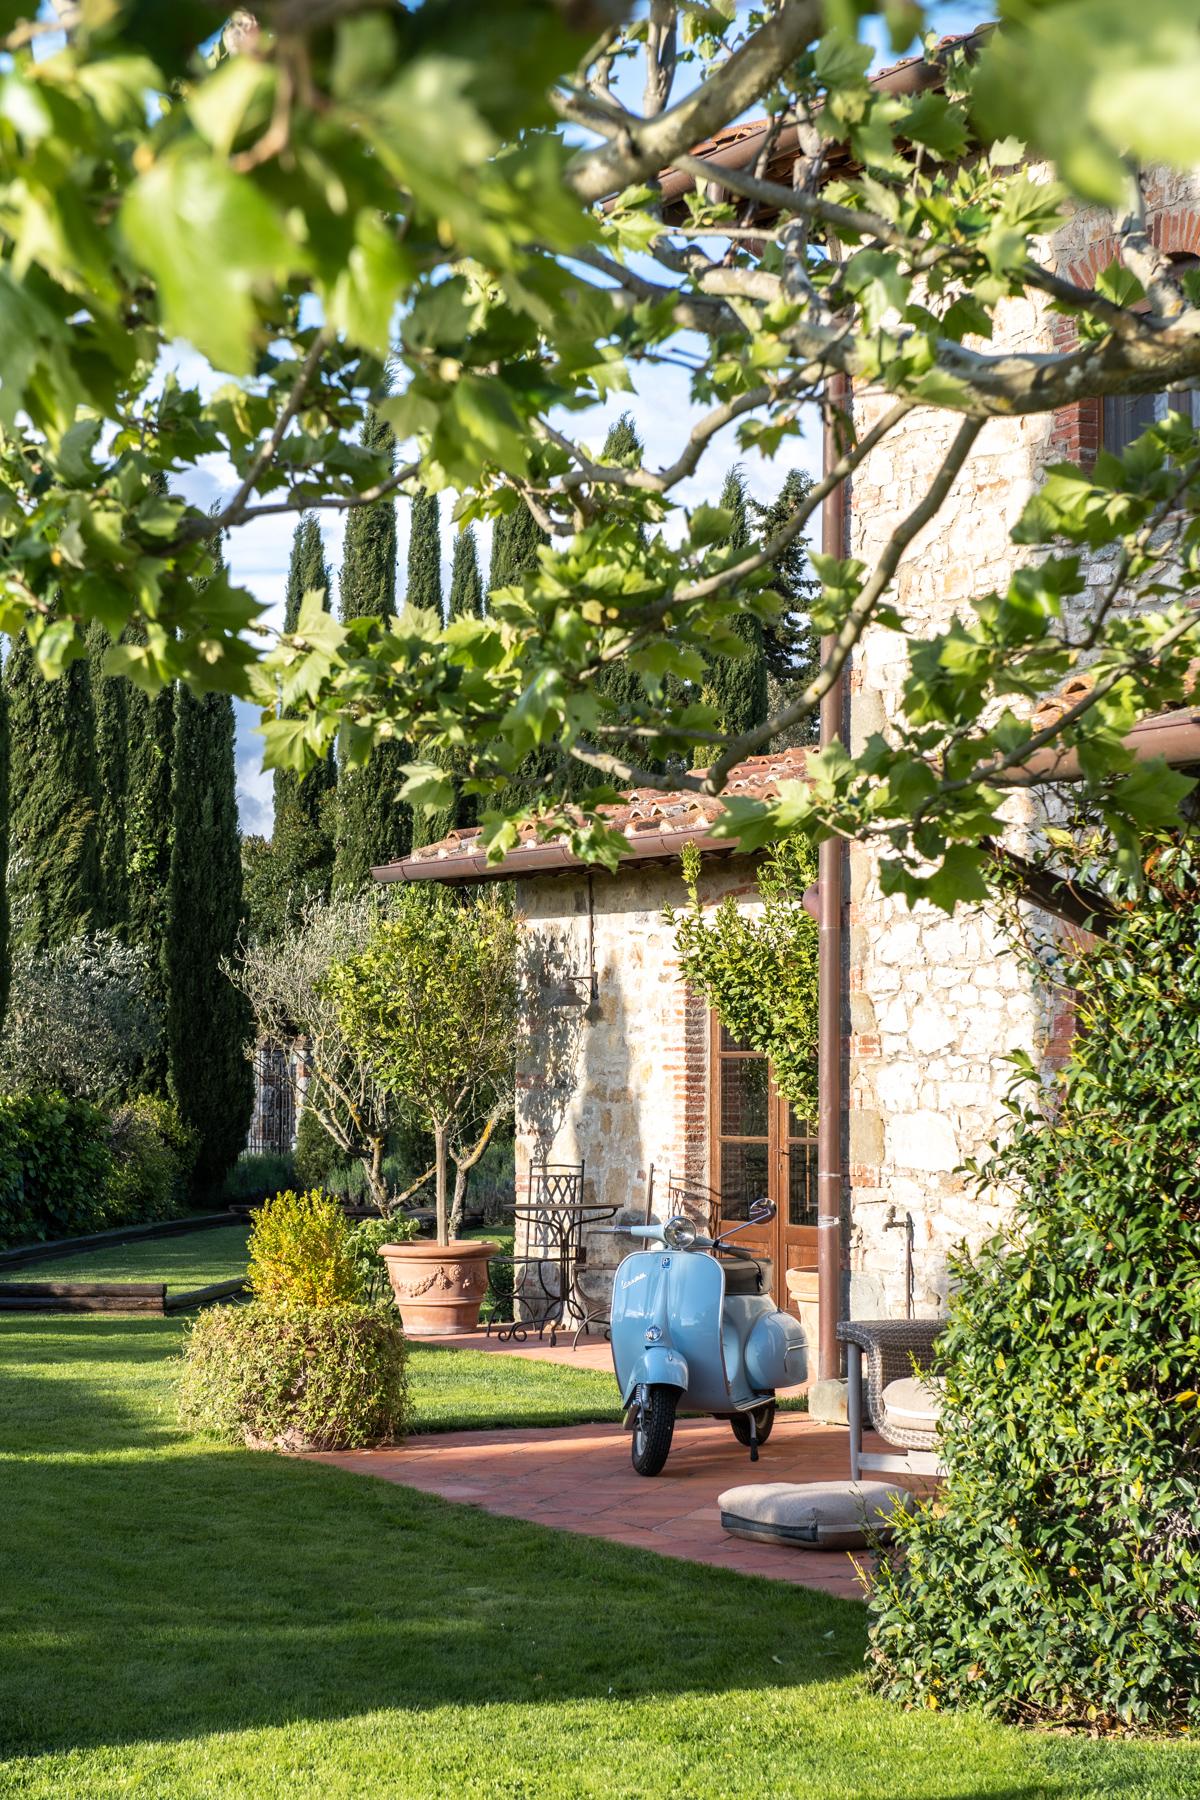 Stacie Flinner x Cuvee Tuscan Farmhouse Tuscany Italy Guide-12.jpg